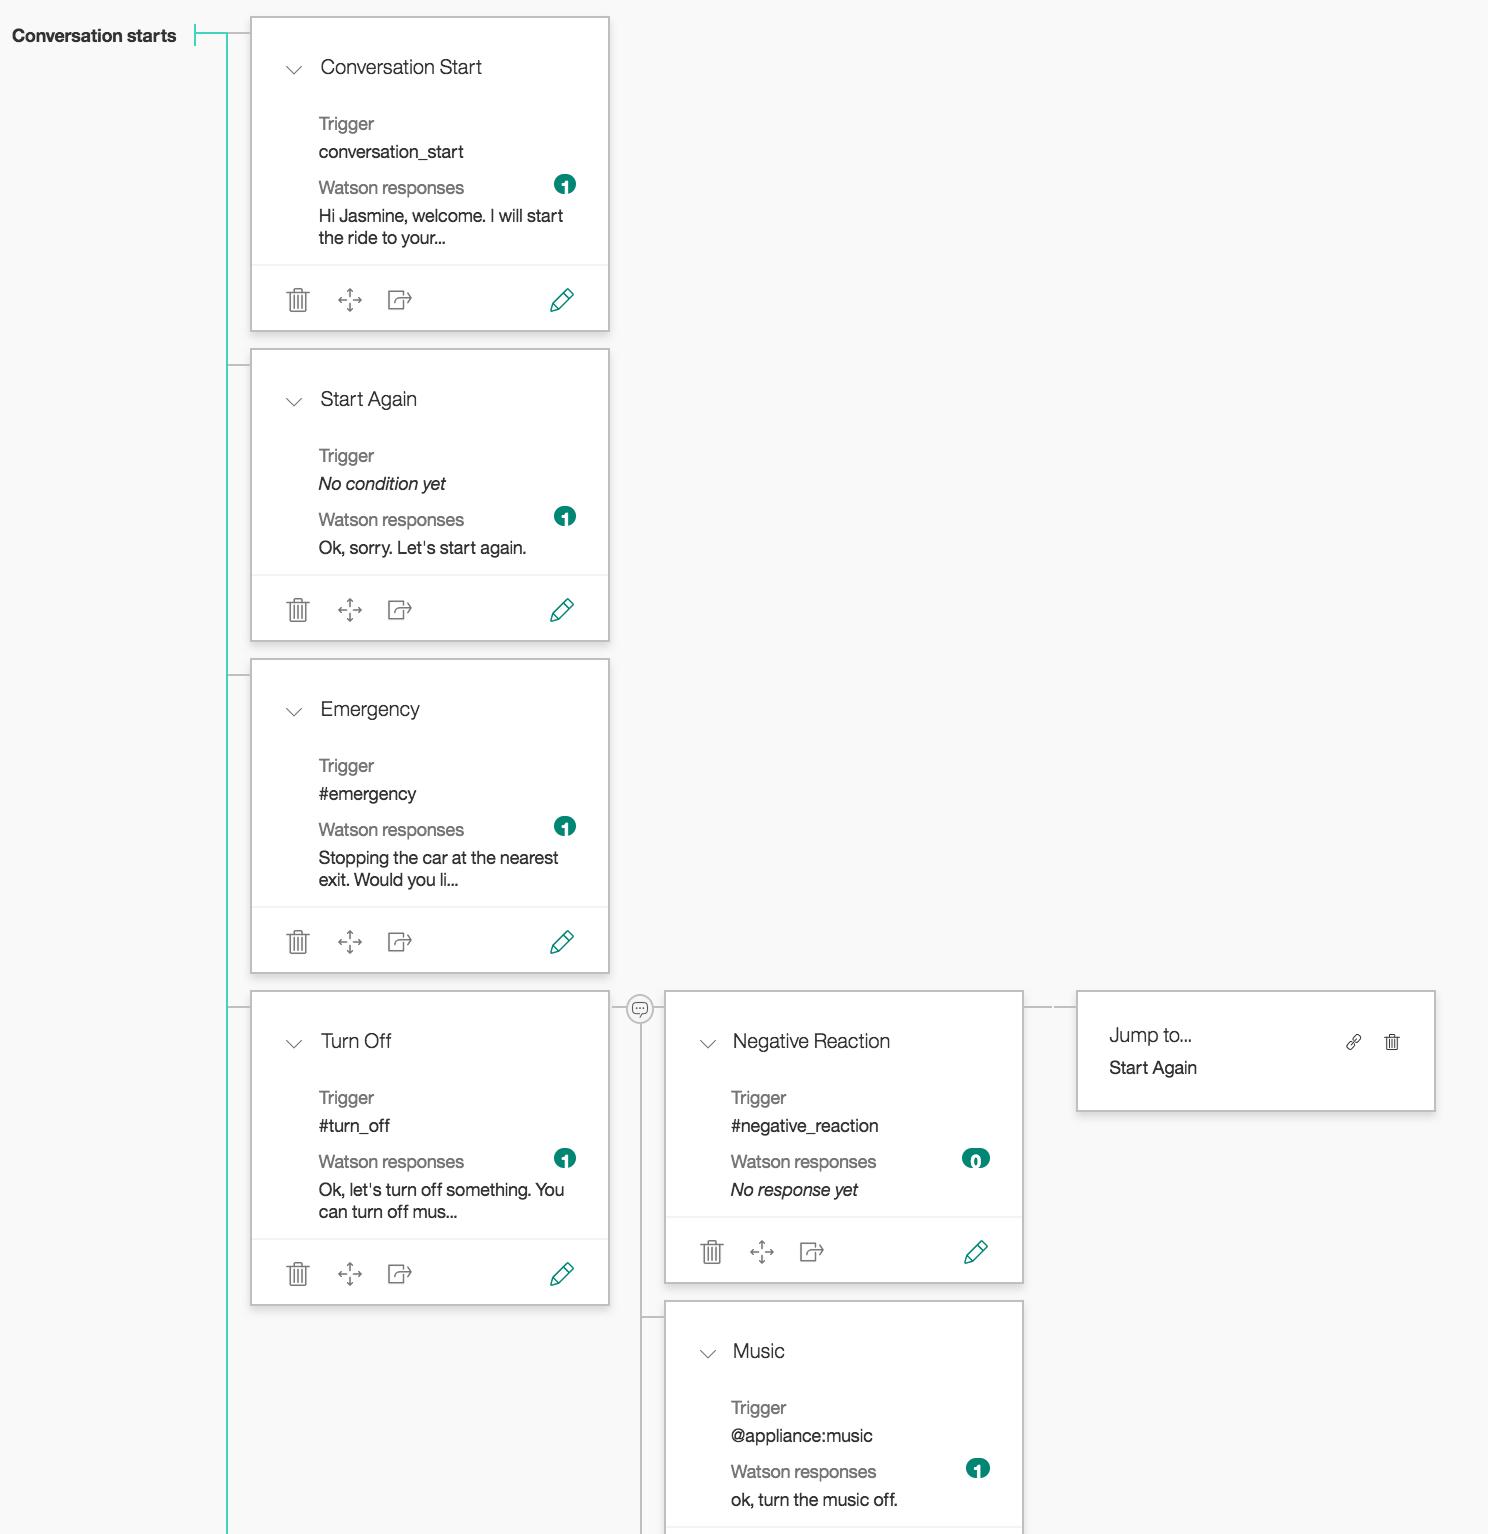 Conversation_Map.png